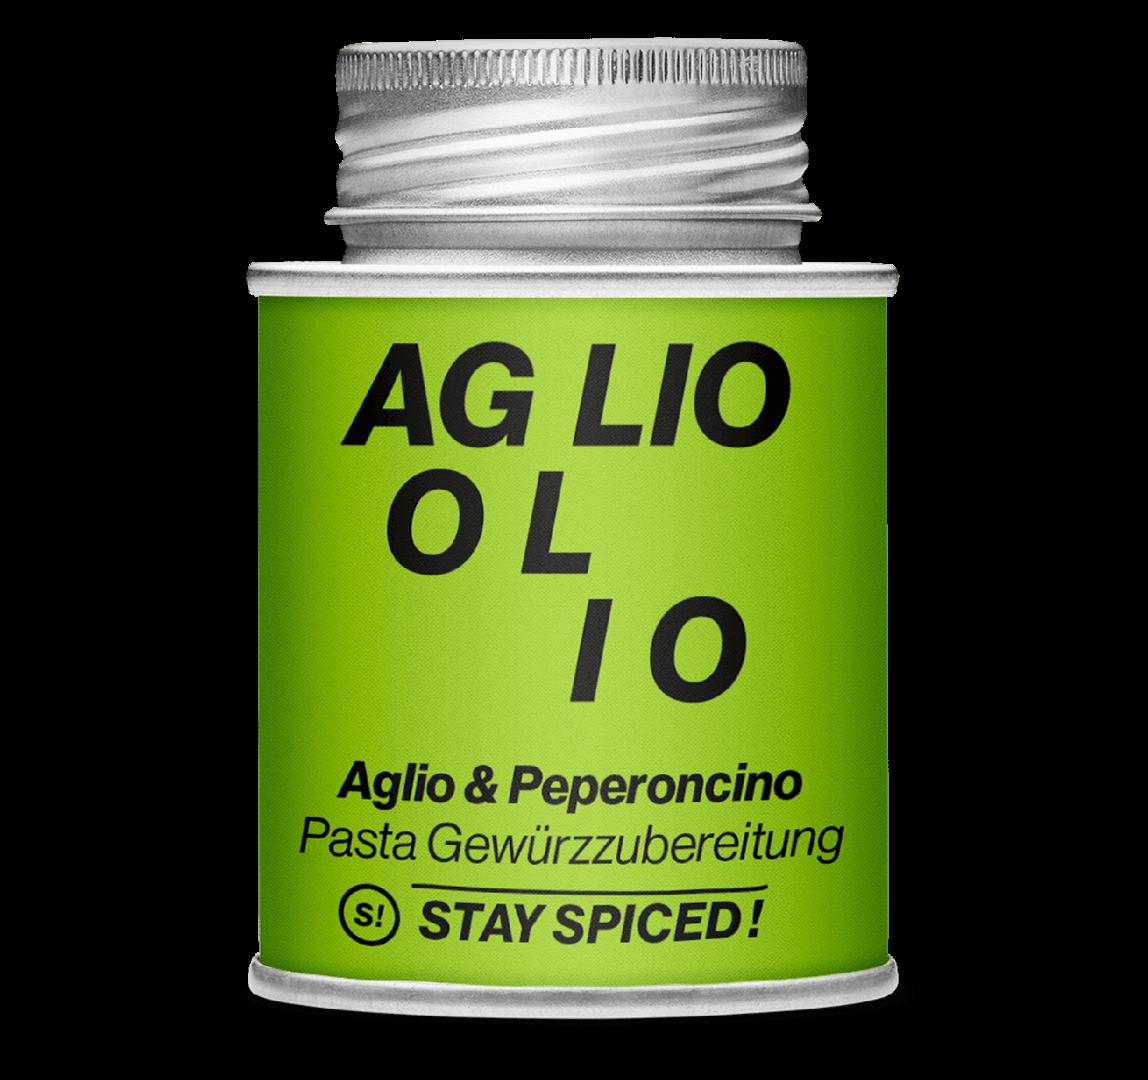 Gewürzzubereitung - Aglio & Peperoncino Gewürzmischung